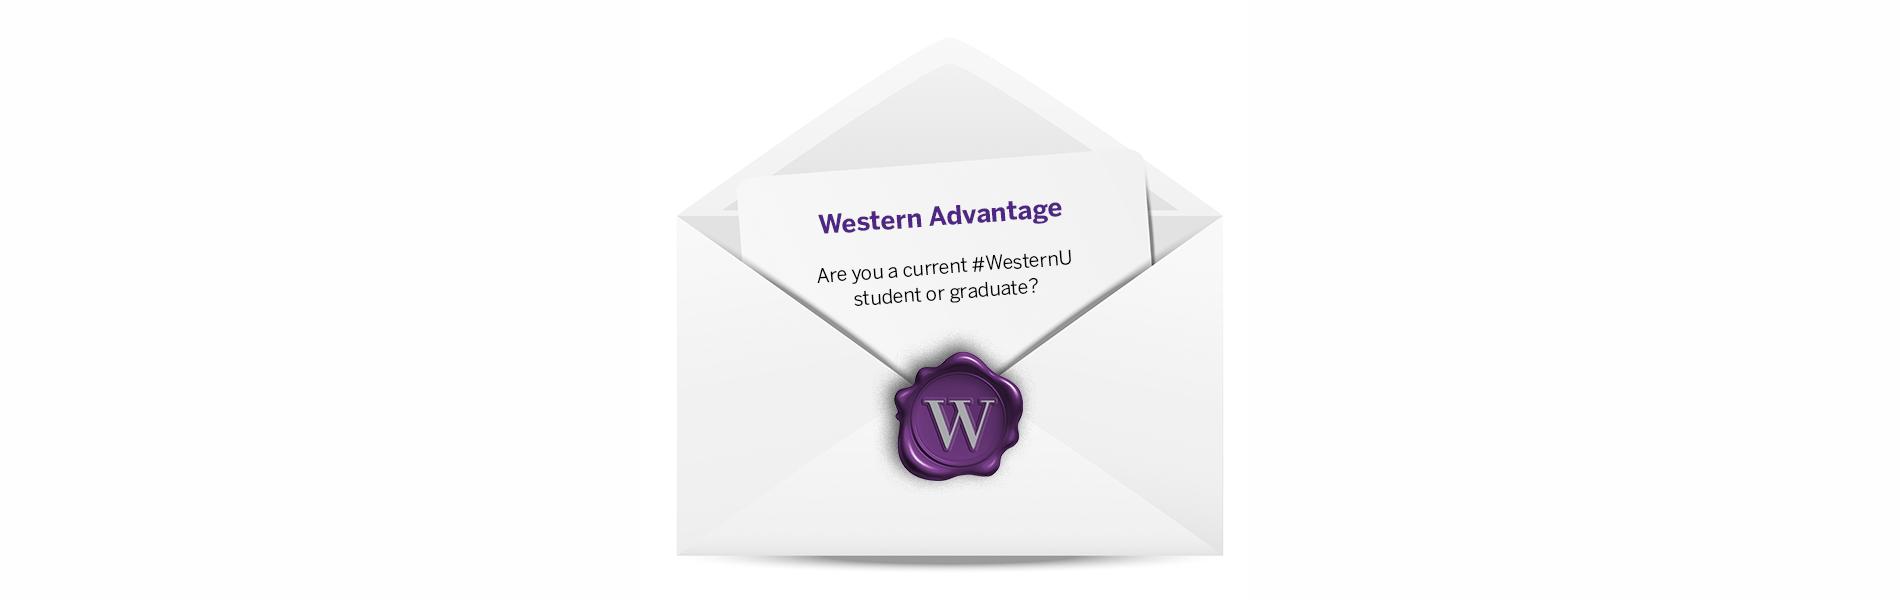 Western Advantage